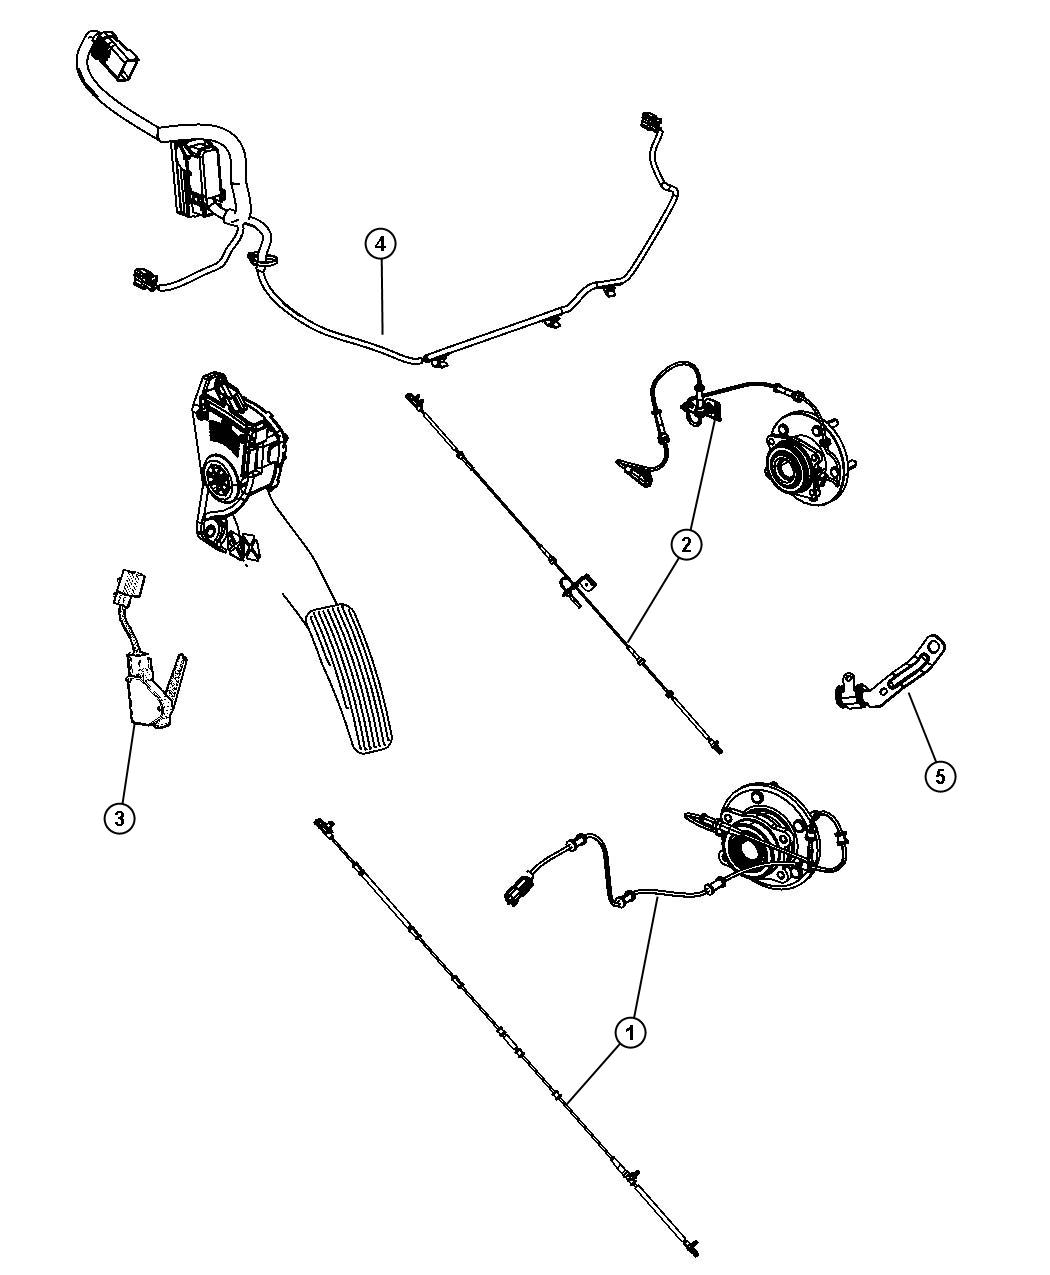 Cross Product Diagram